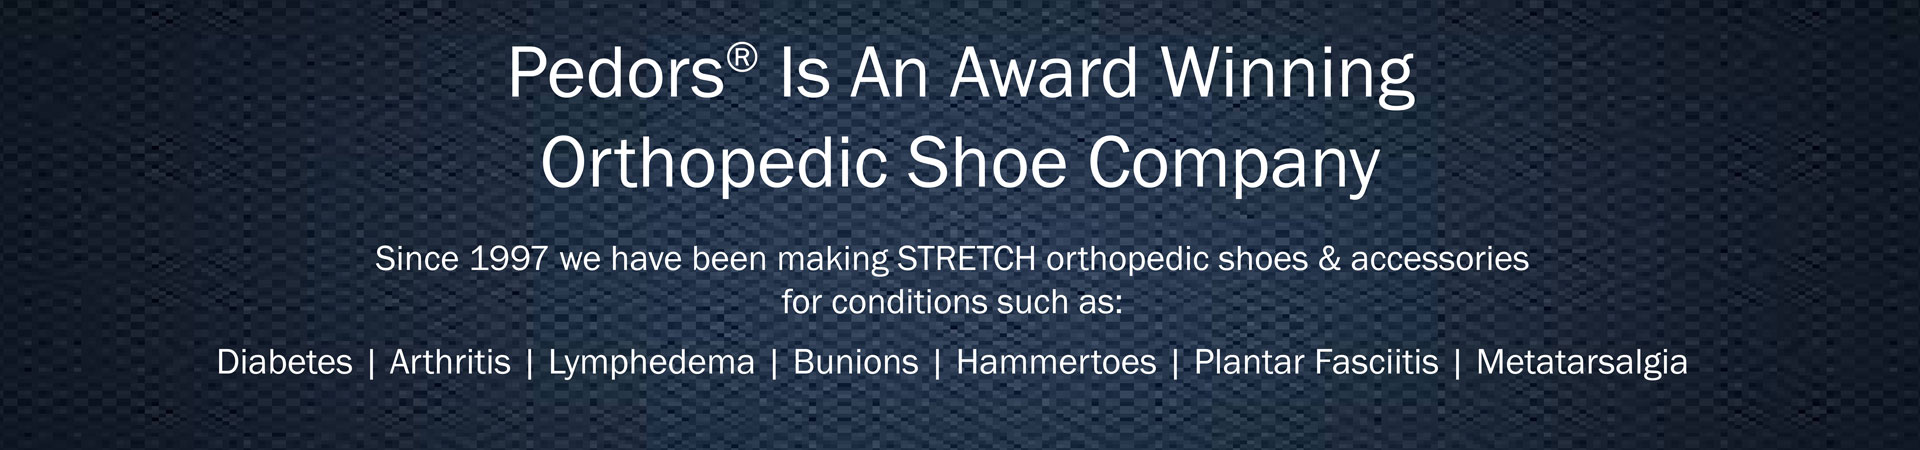 Pedors is an award winning orthopedic shoe company